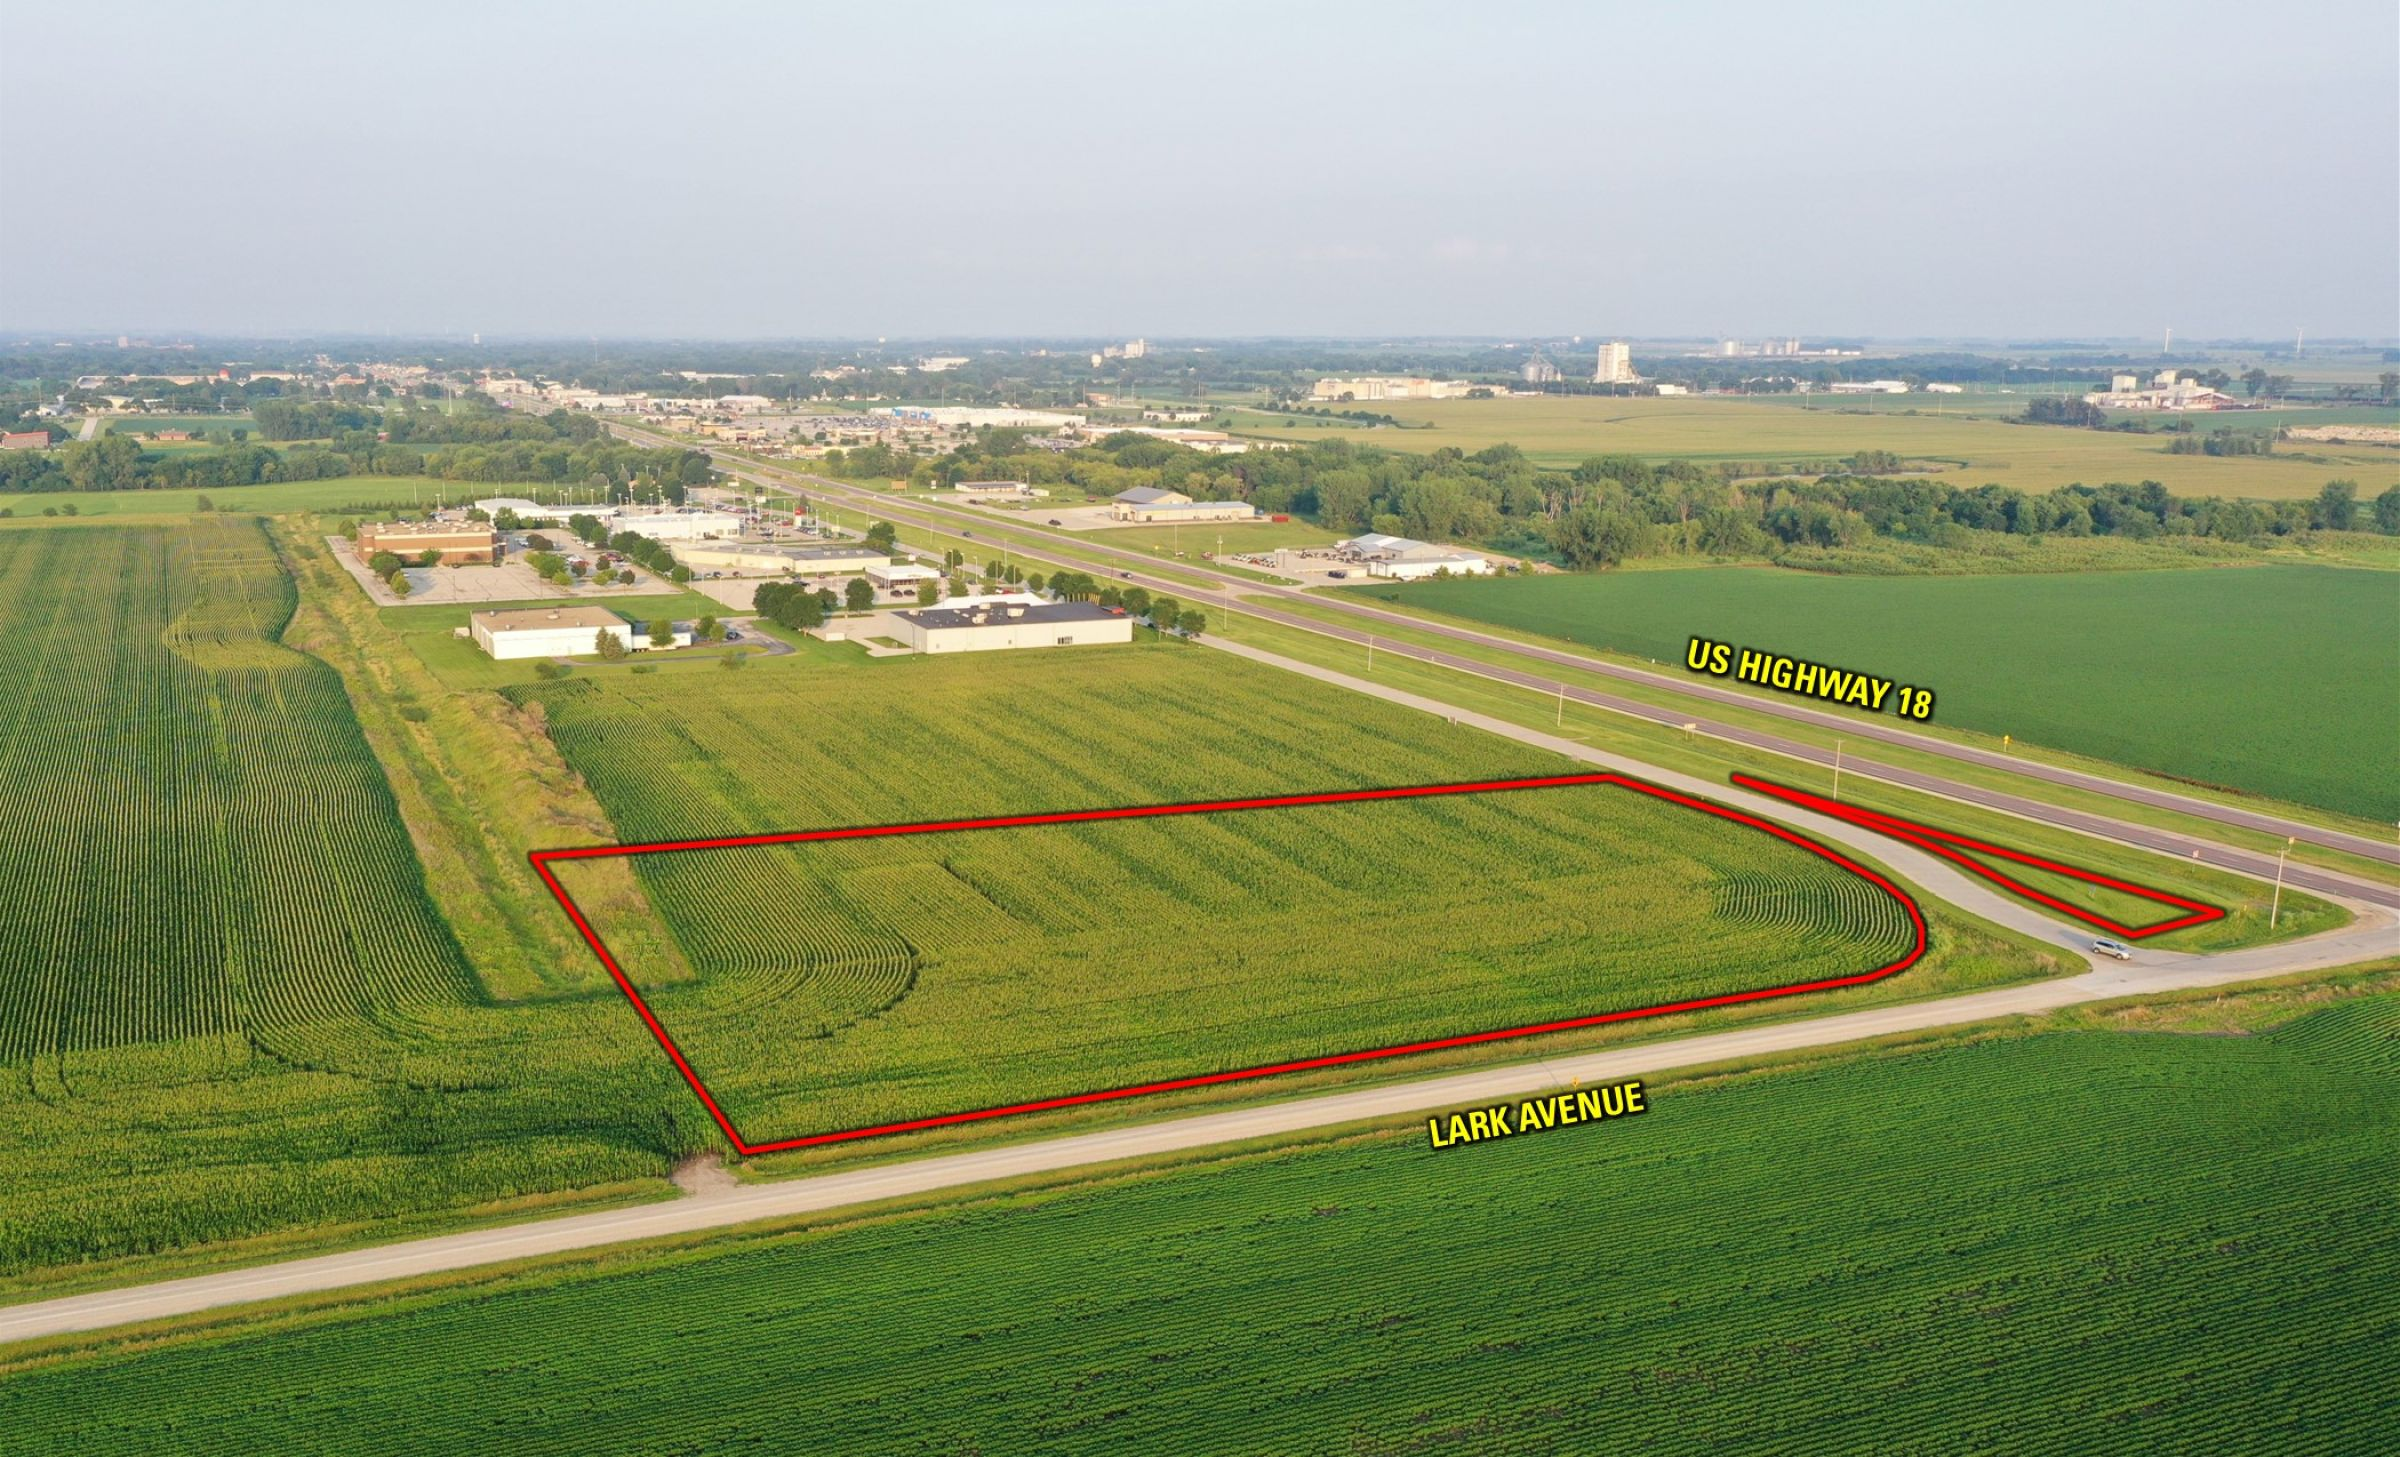 development-land-commercial-cerro-gordo-county-iowa-4-acres-listing-number-15642-4-2021-07-20-031833.jpg